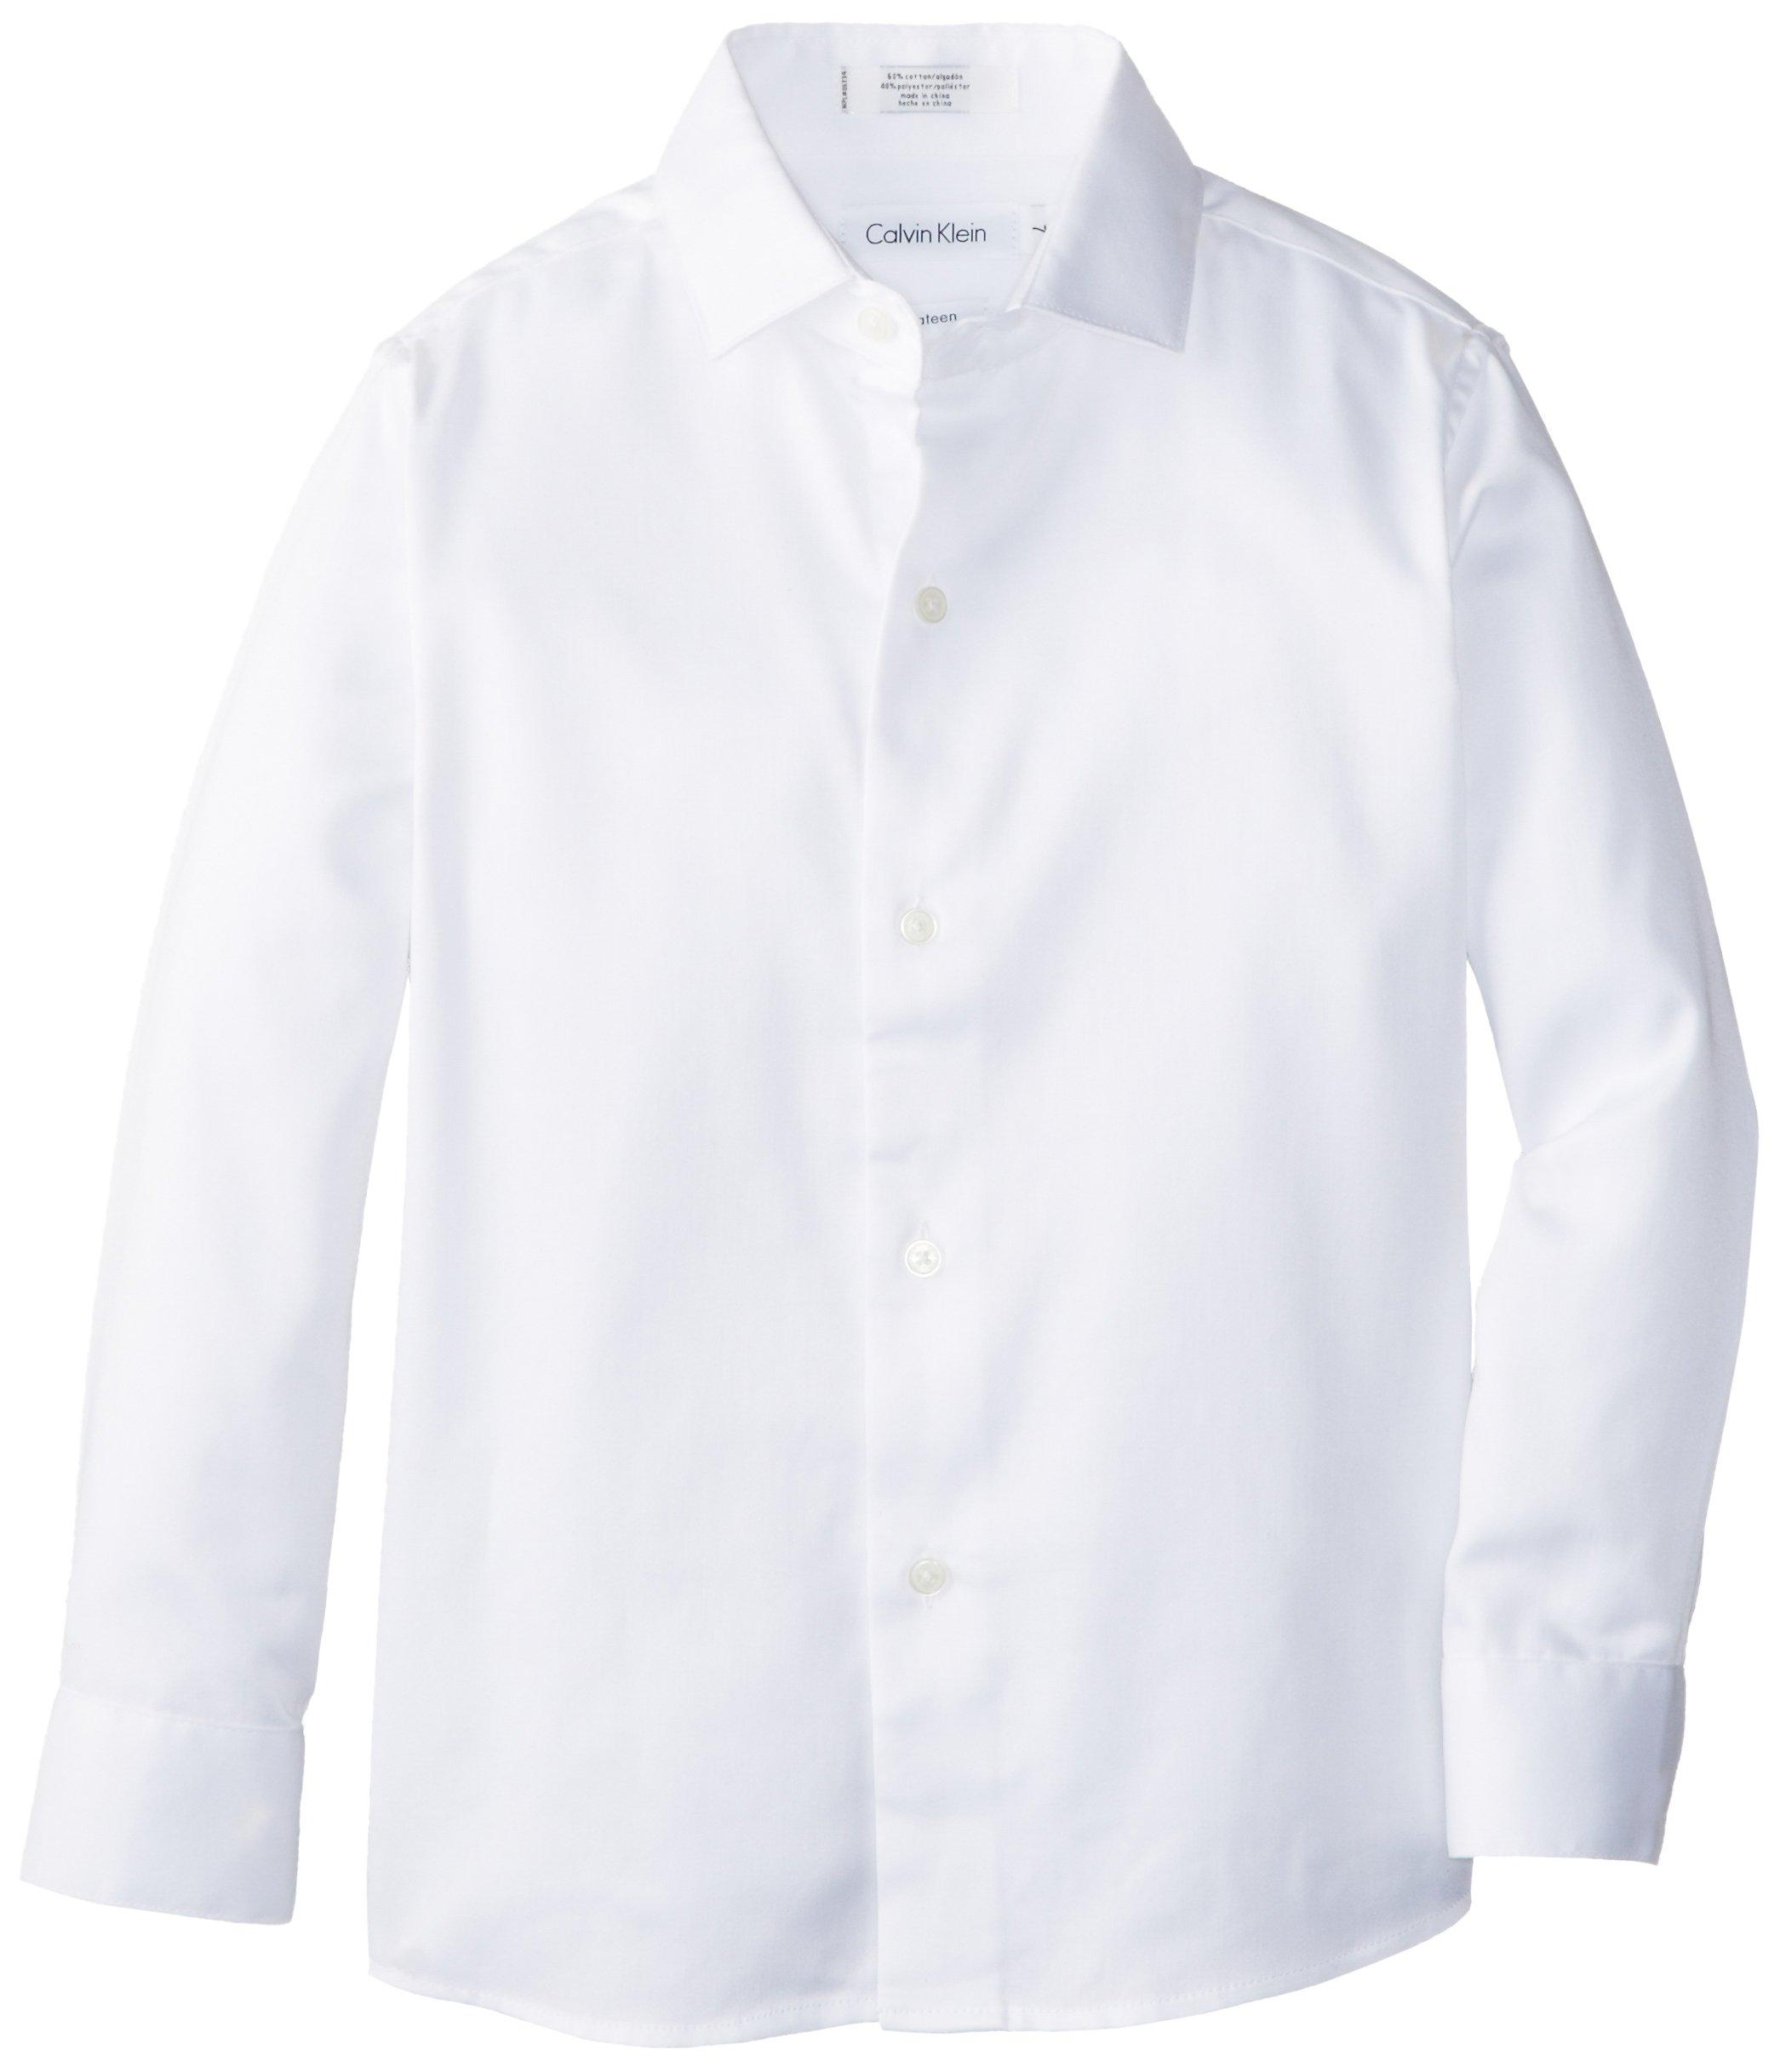 Calvin Klein Little Boys' Long Sleeve Sateen Dress Shirt, White, 4